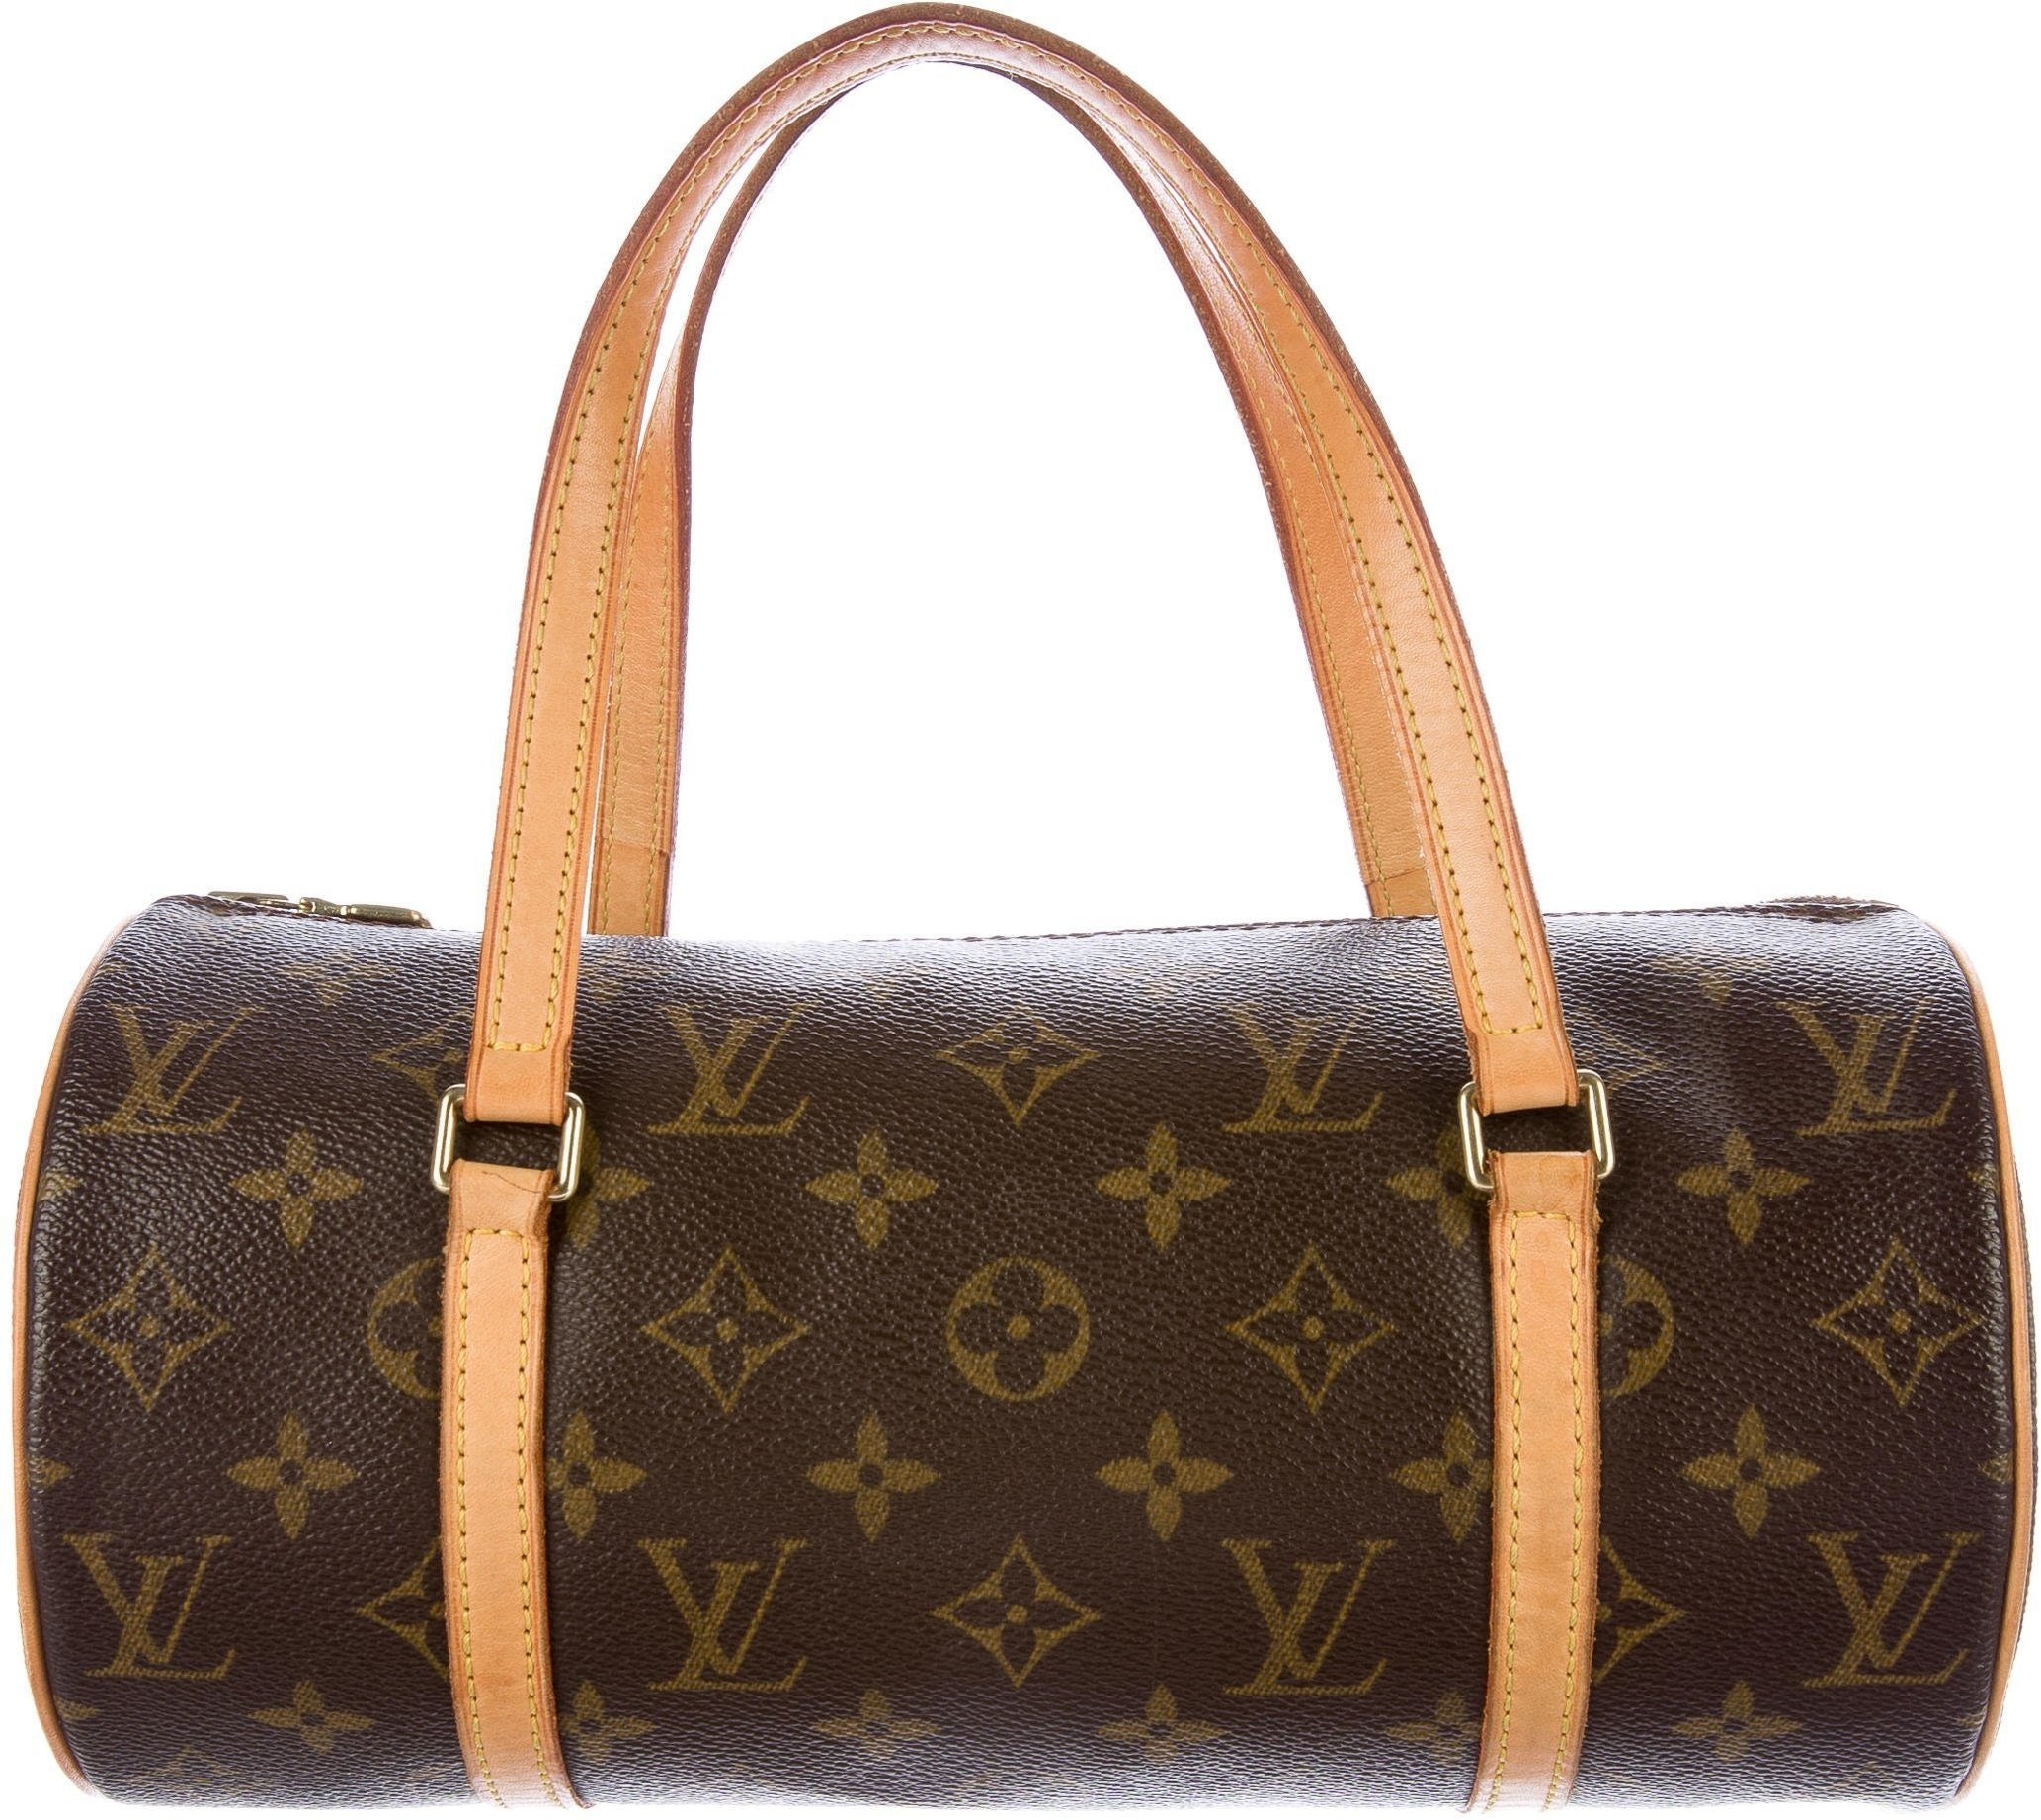 Louis Vuitton Papillon Monogram 28 Brown